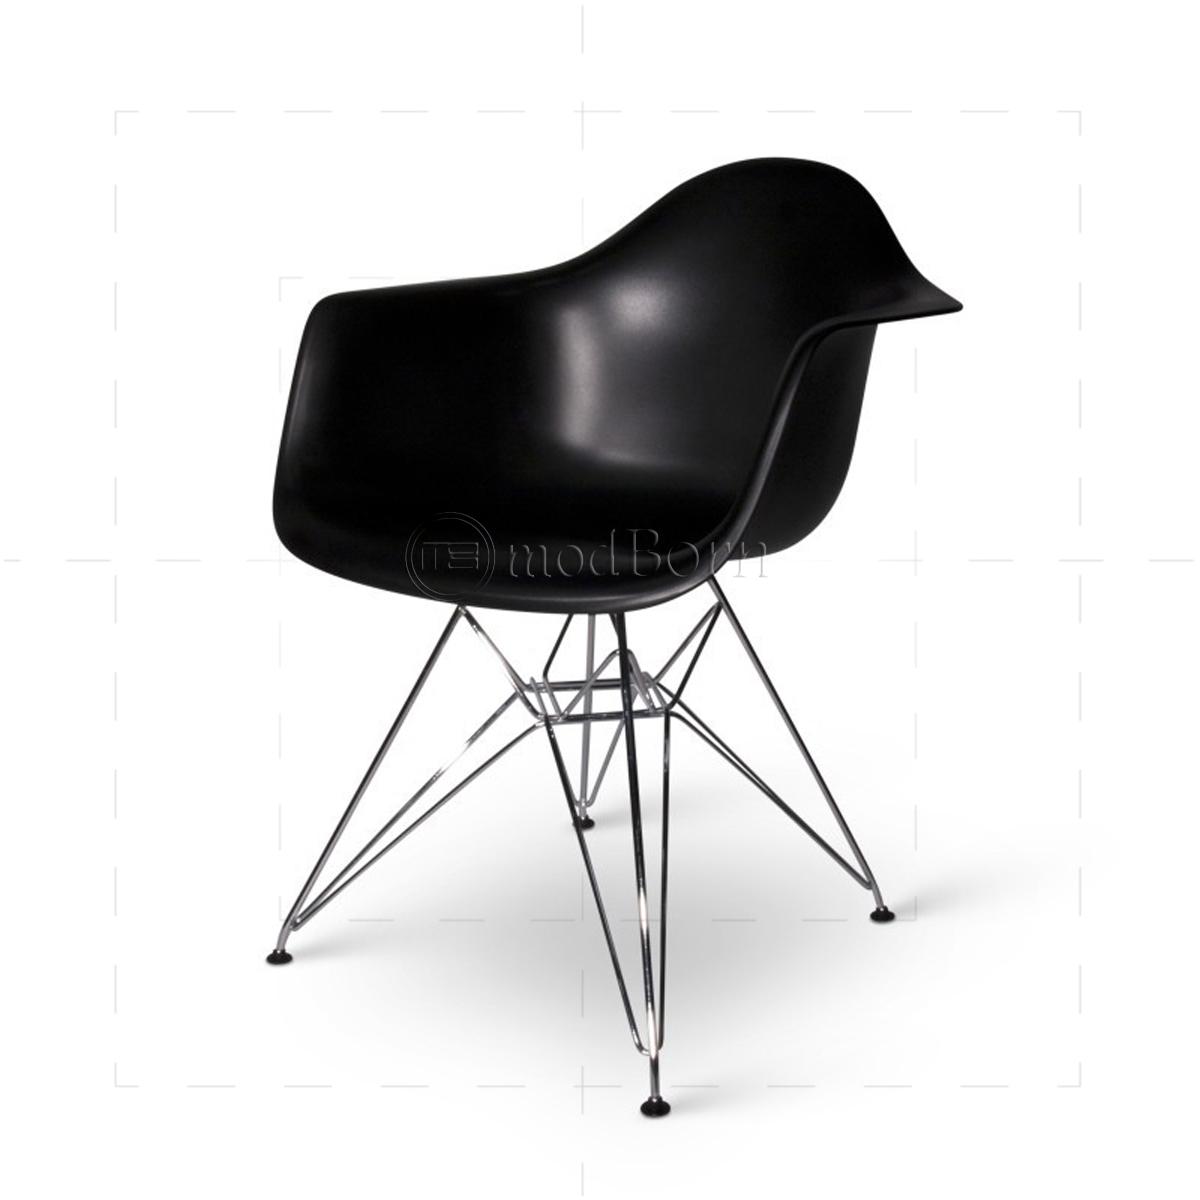 Eames Style Dining DAR Arm Chair Black : eamesdarchairblack 1 1200x1200 from www.modborn.com size 1200 x 1200 jpeg 267kB